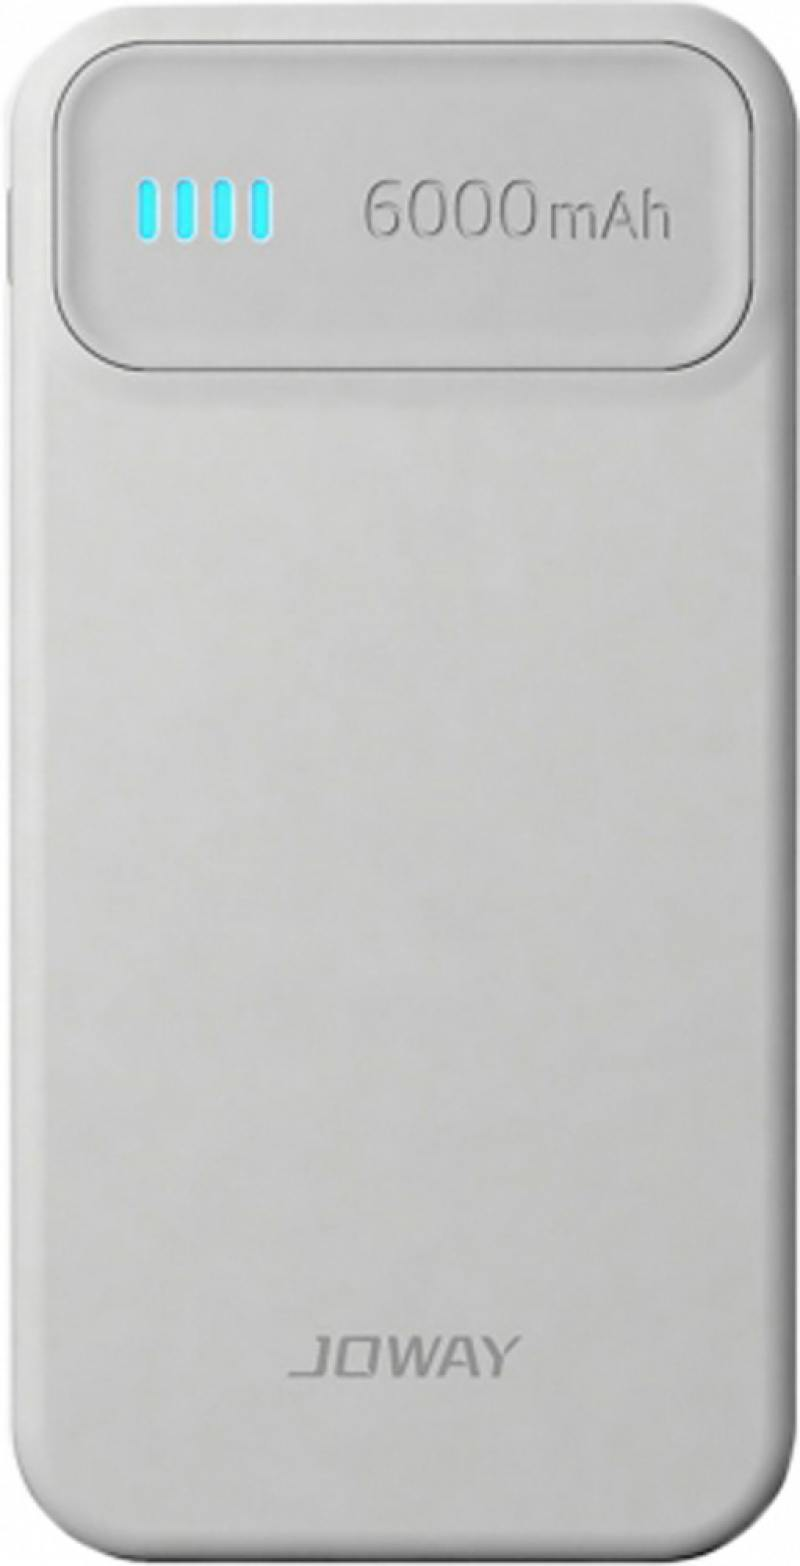 Внешний аккумулятор Joway JP61 6000 mAh белый серый аккумулятор gopro portable power pack 6000 mah azpbc 001